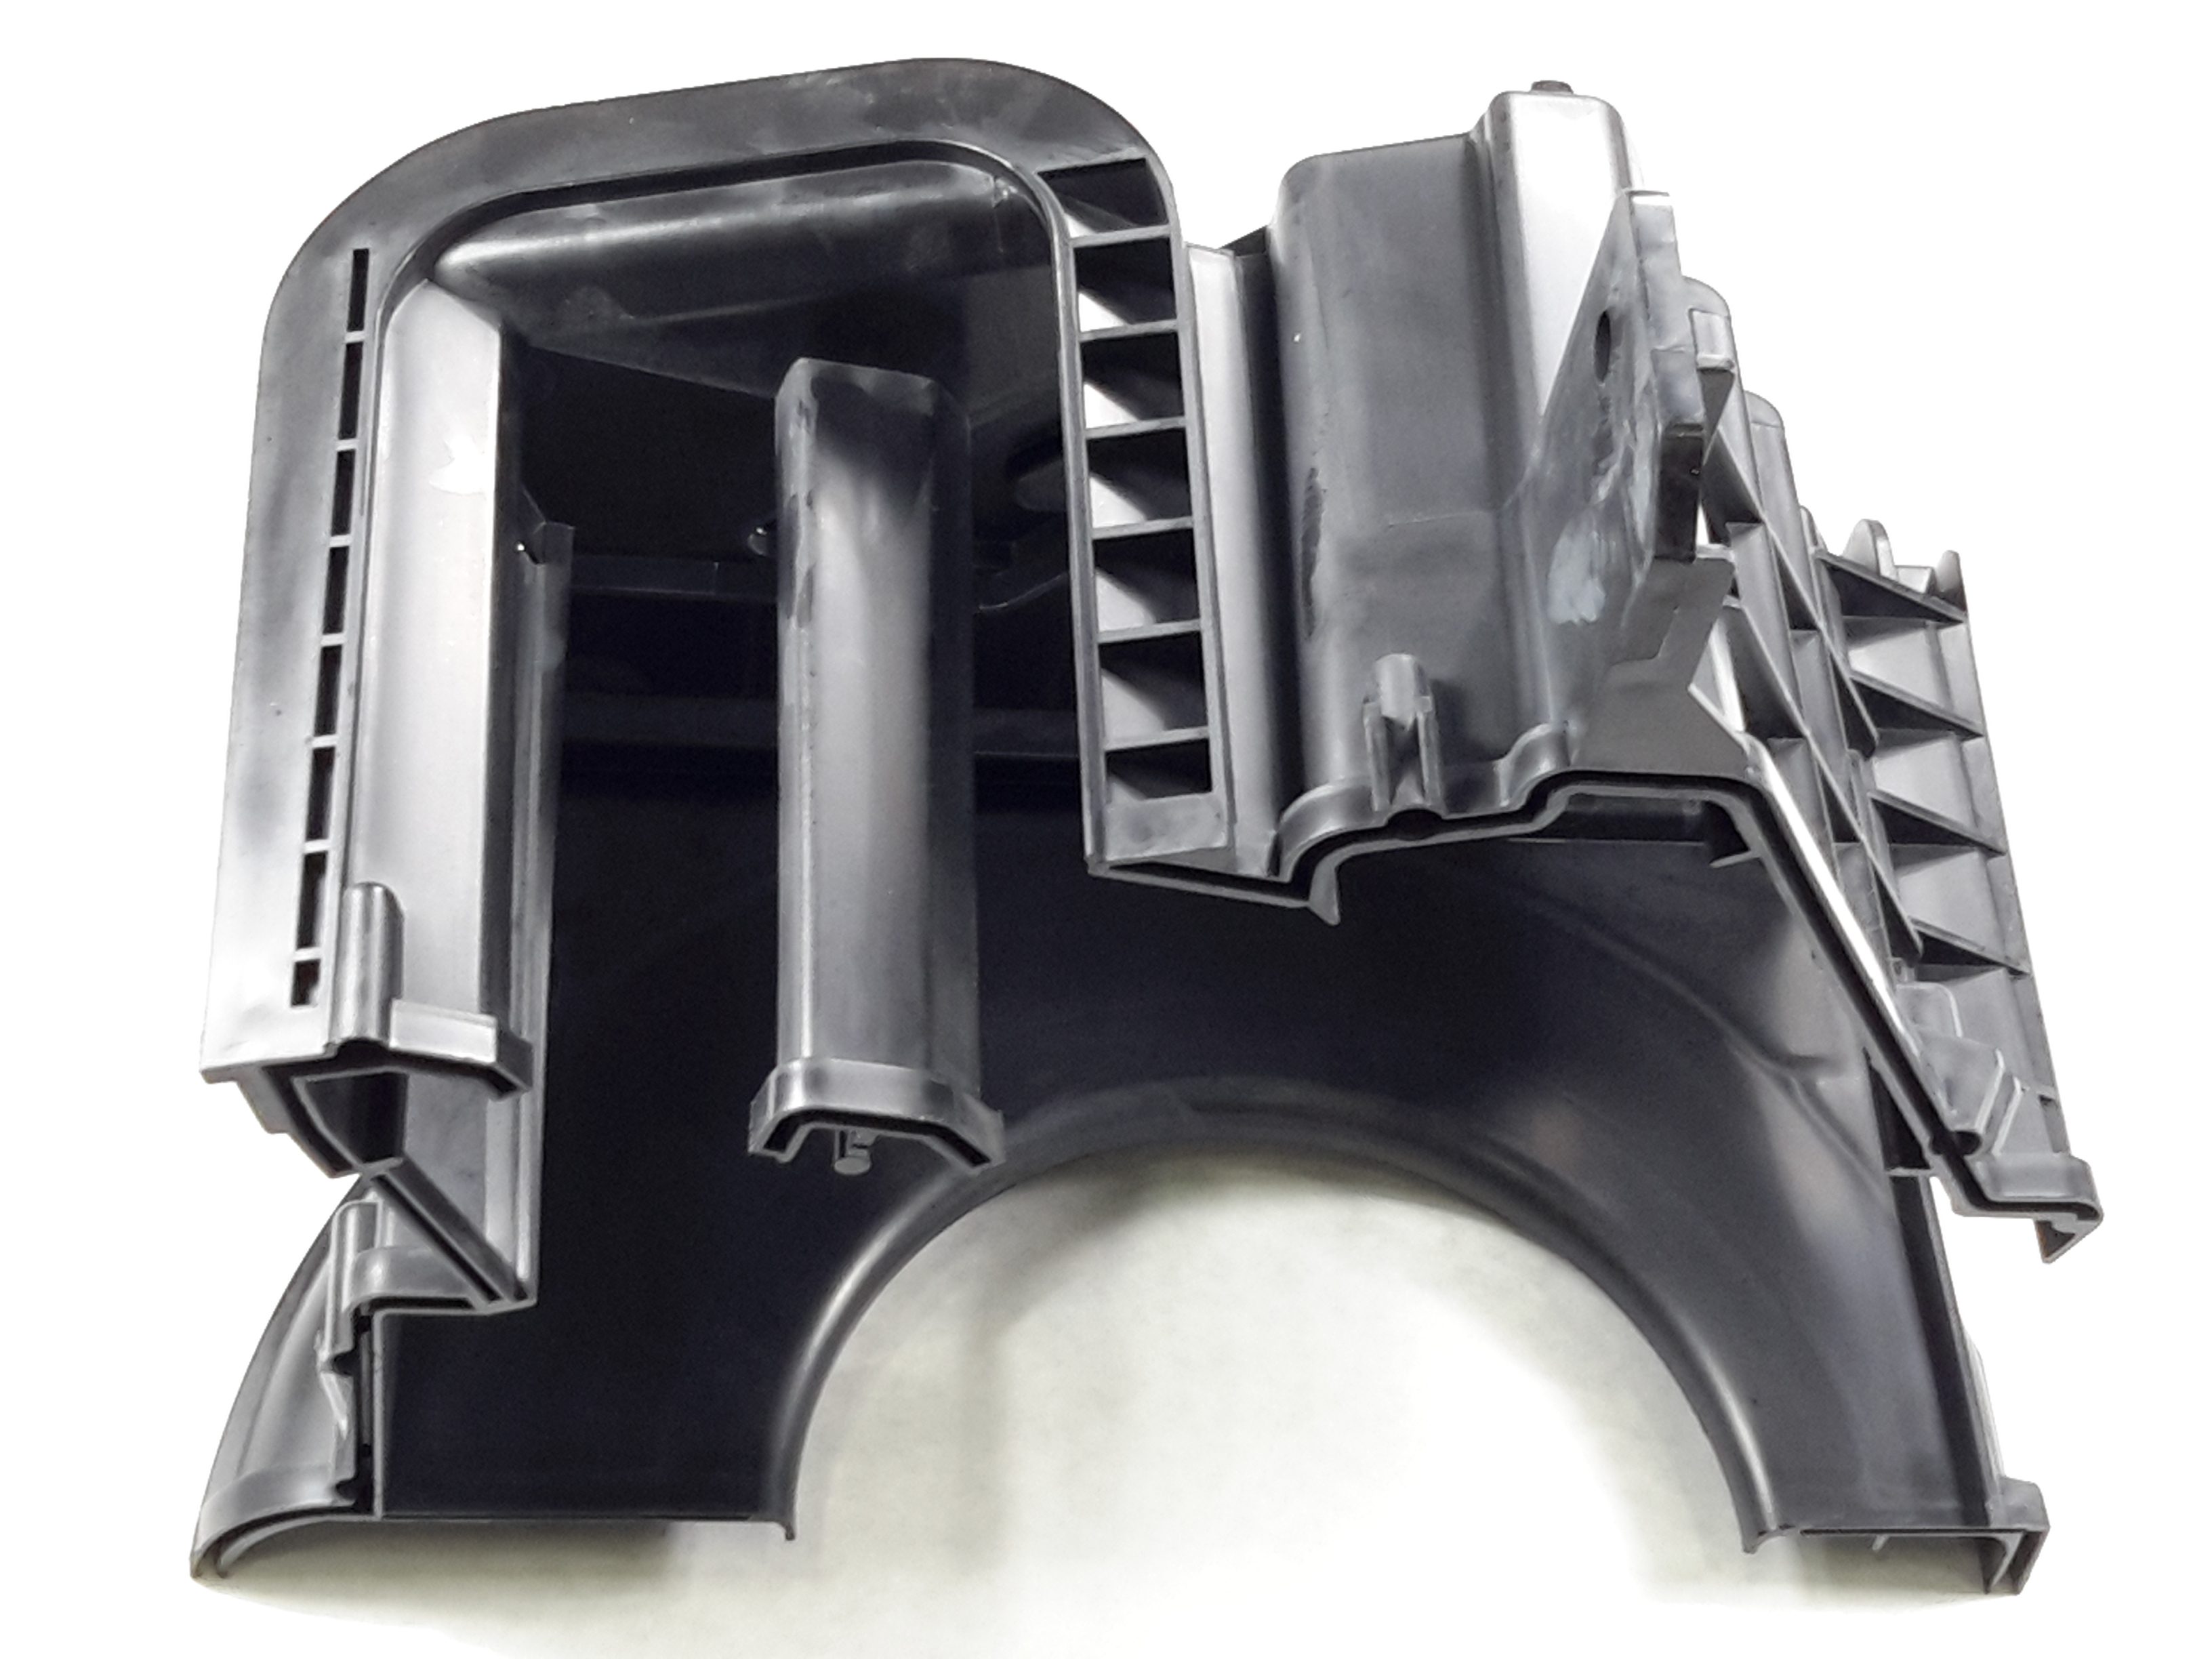 Subaru impreza case blower intake left system heater for 2008 subaru impreza blower motor